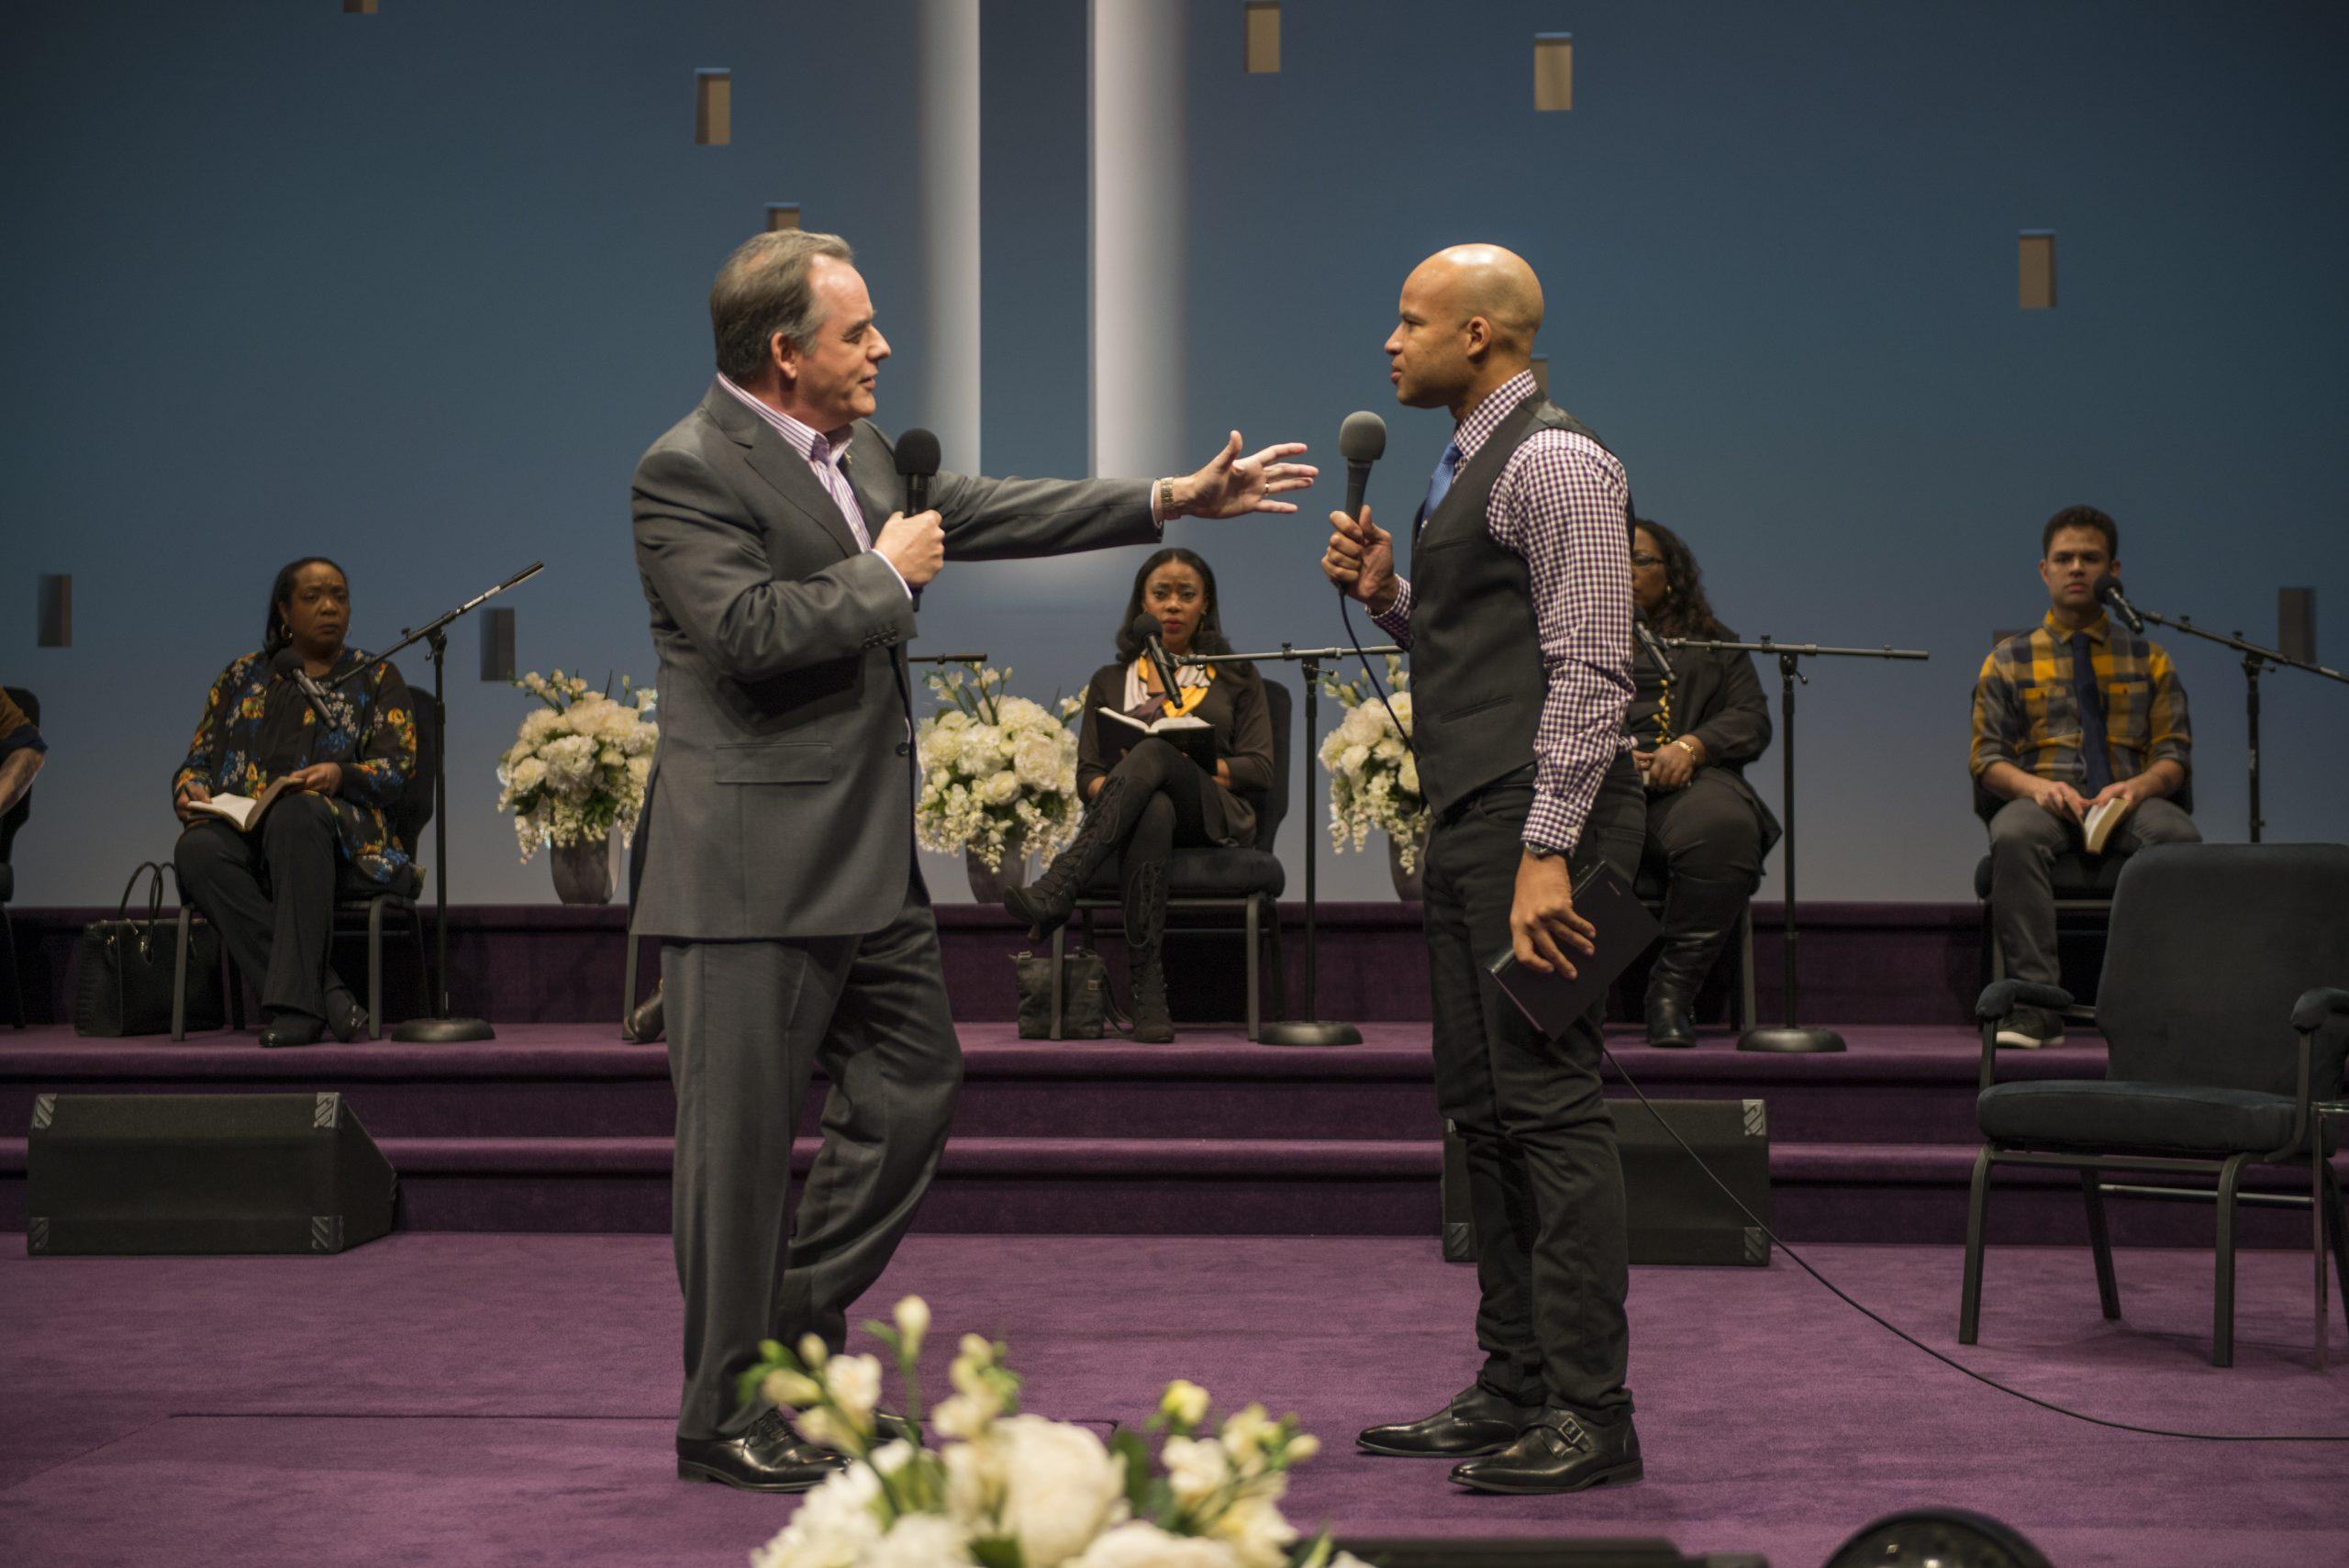 Pastor Paul (Tom Irwin) has a theological debate with an associate pastor (Glenn Davis) in <i>The Christians</i>.